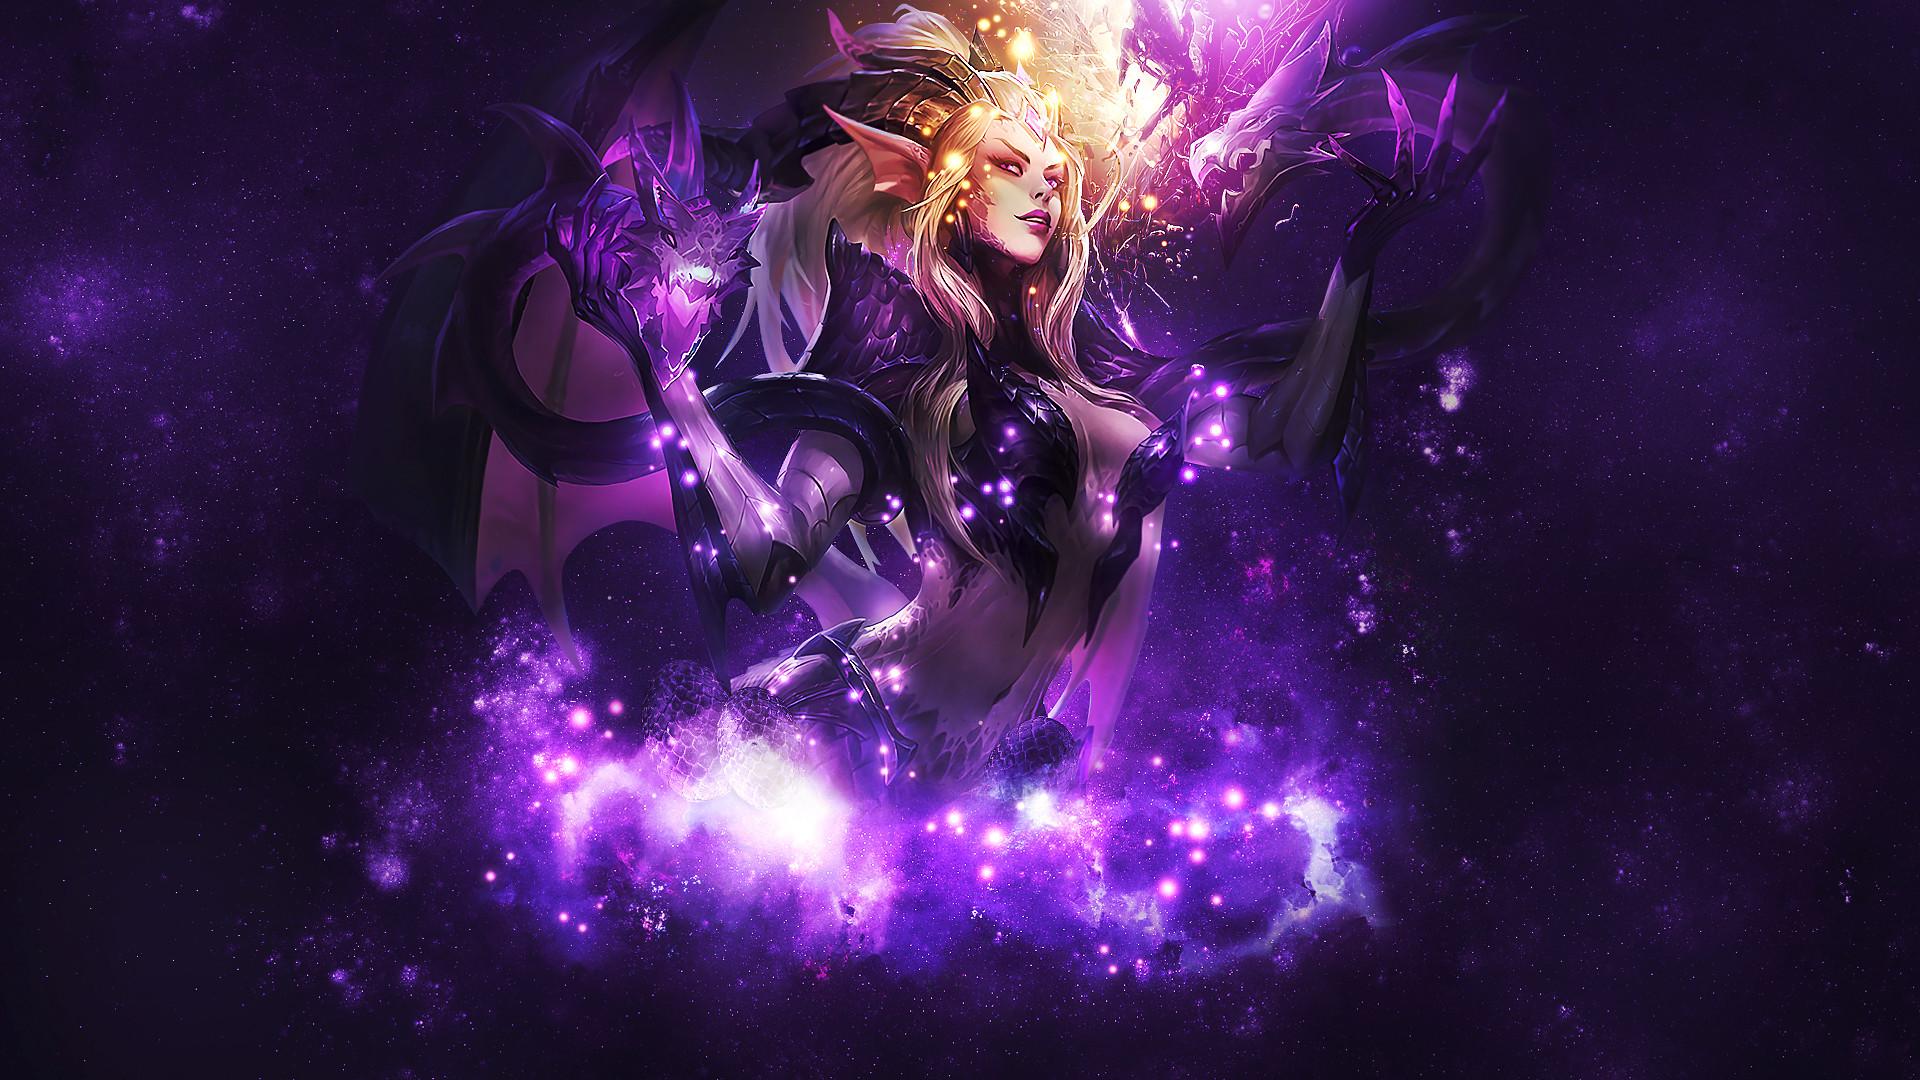 Ecchi Anime Demon Girl Wallpaper Android Purple Dragon Wallpaper 71 Images